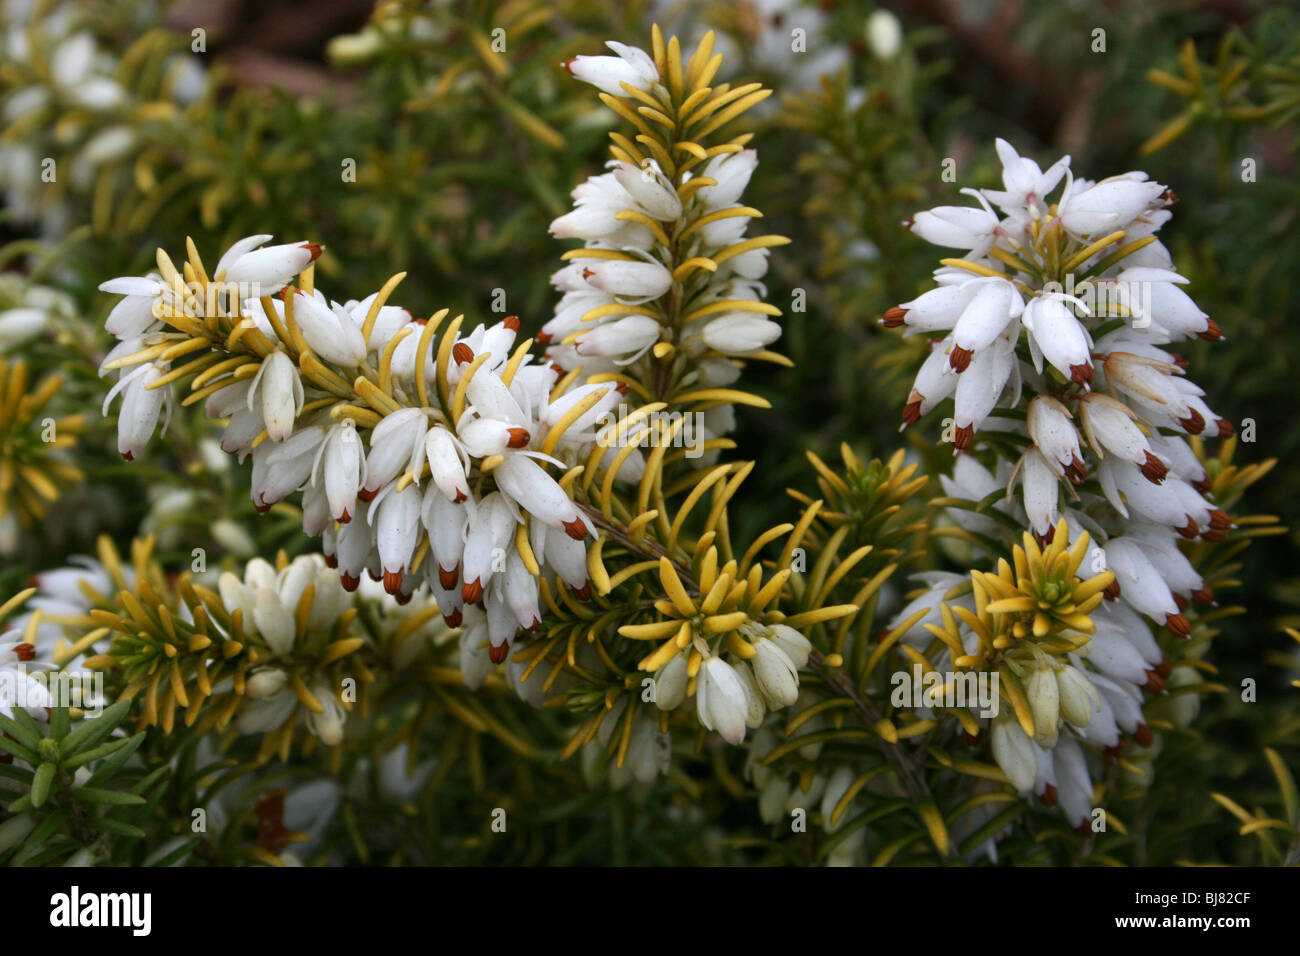 Erica heather white flower garden stock photos erica heather white white heather erica carnea taken in hale village merseyside uk stock image mightylinksfo